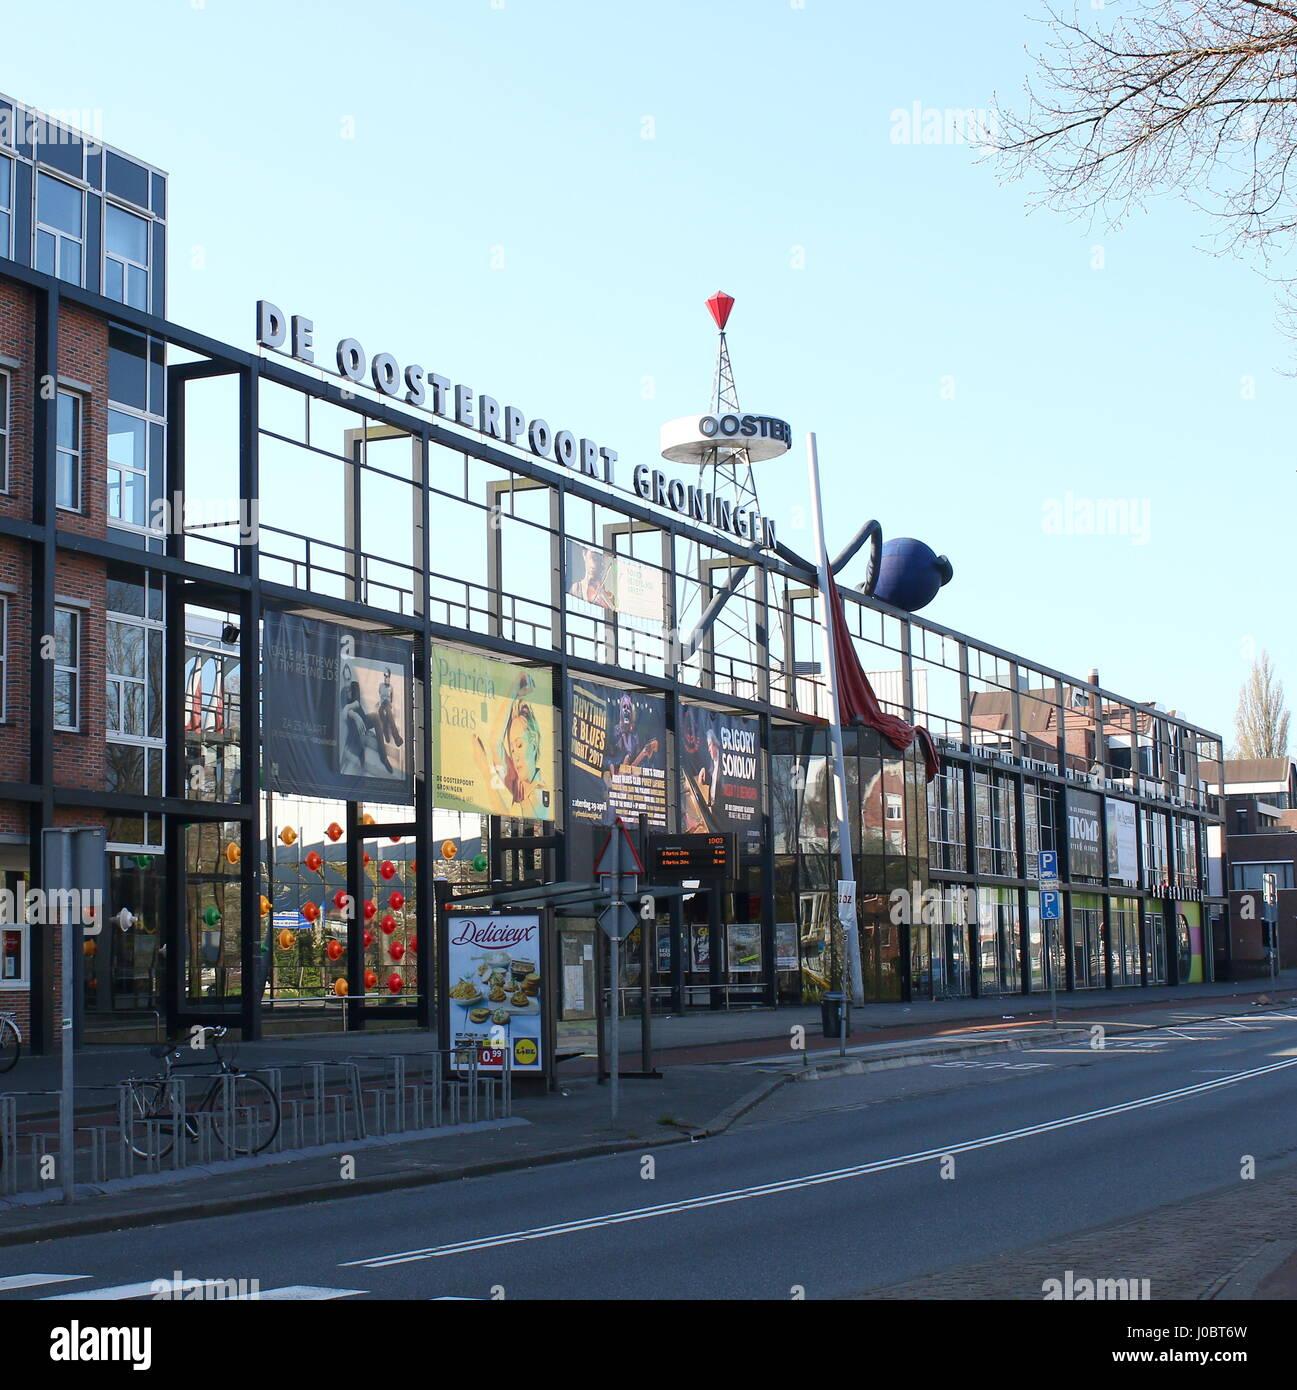 cultural centre de oosterpoort groningen netherlands music and stock photo 137943425 alamy. Black Bedroom Furniture Sets. Home Design Ideas